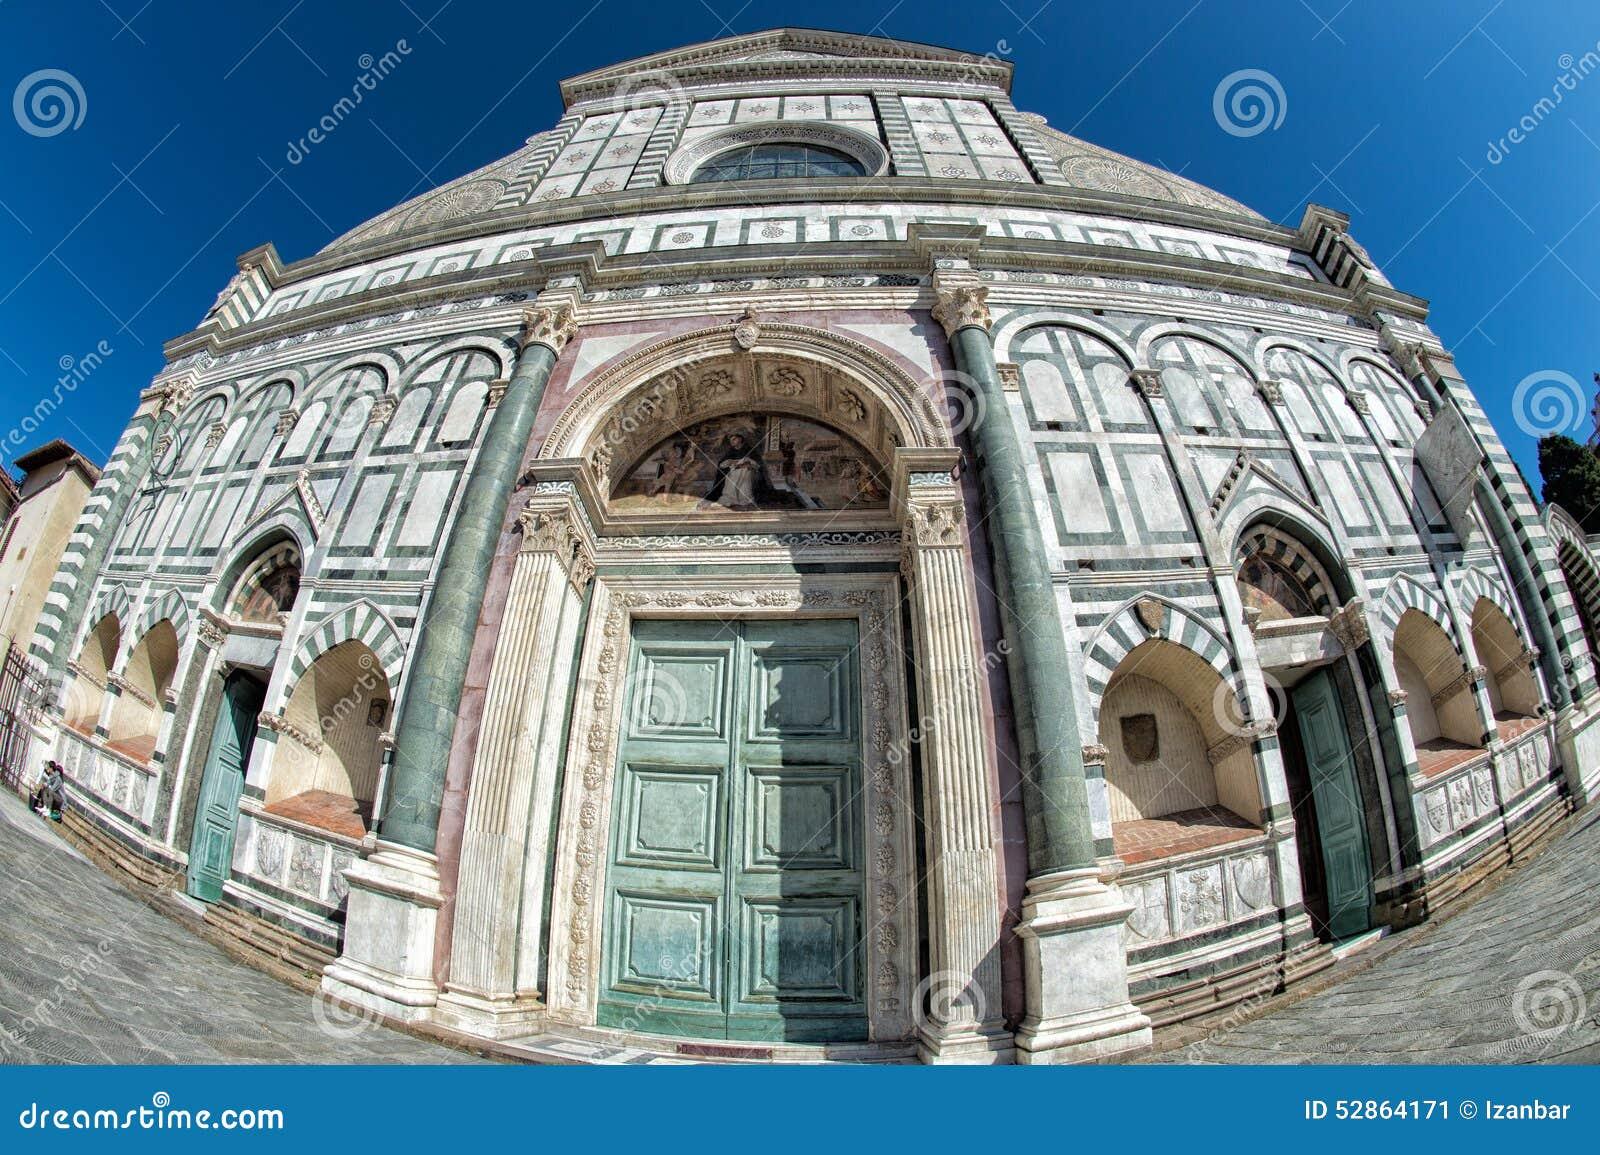 Cathedral Santa Maria del Fiore, Florence, Italy